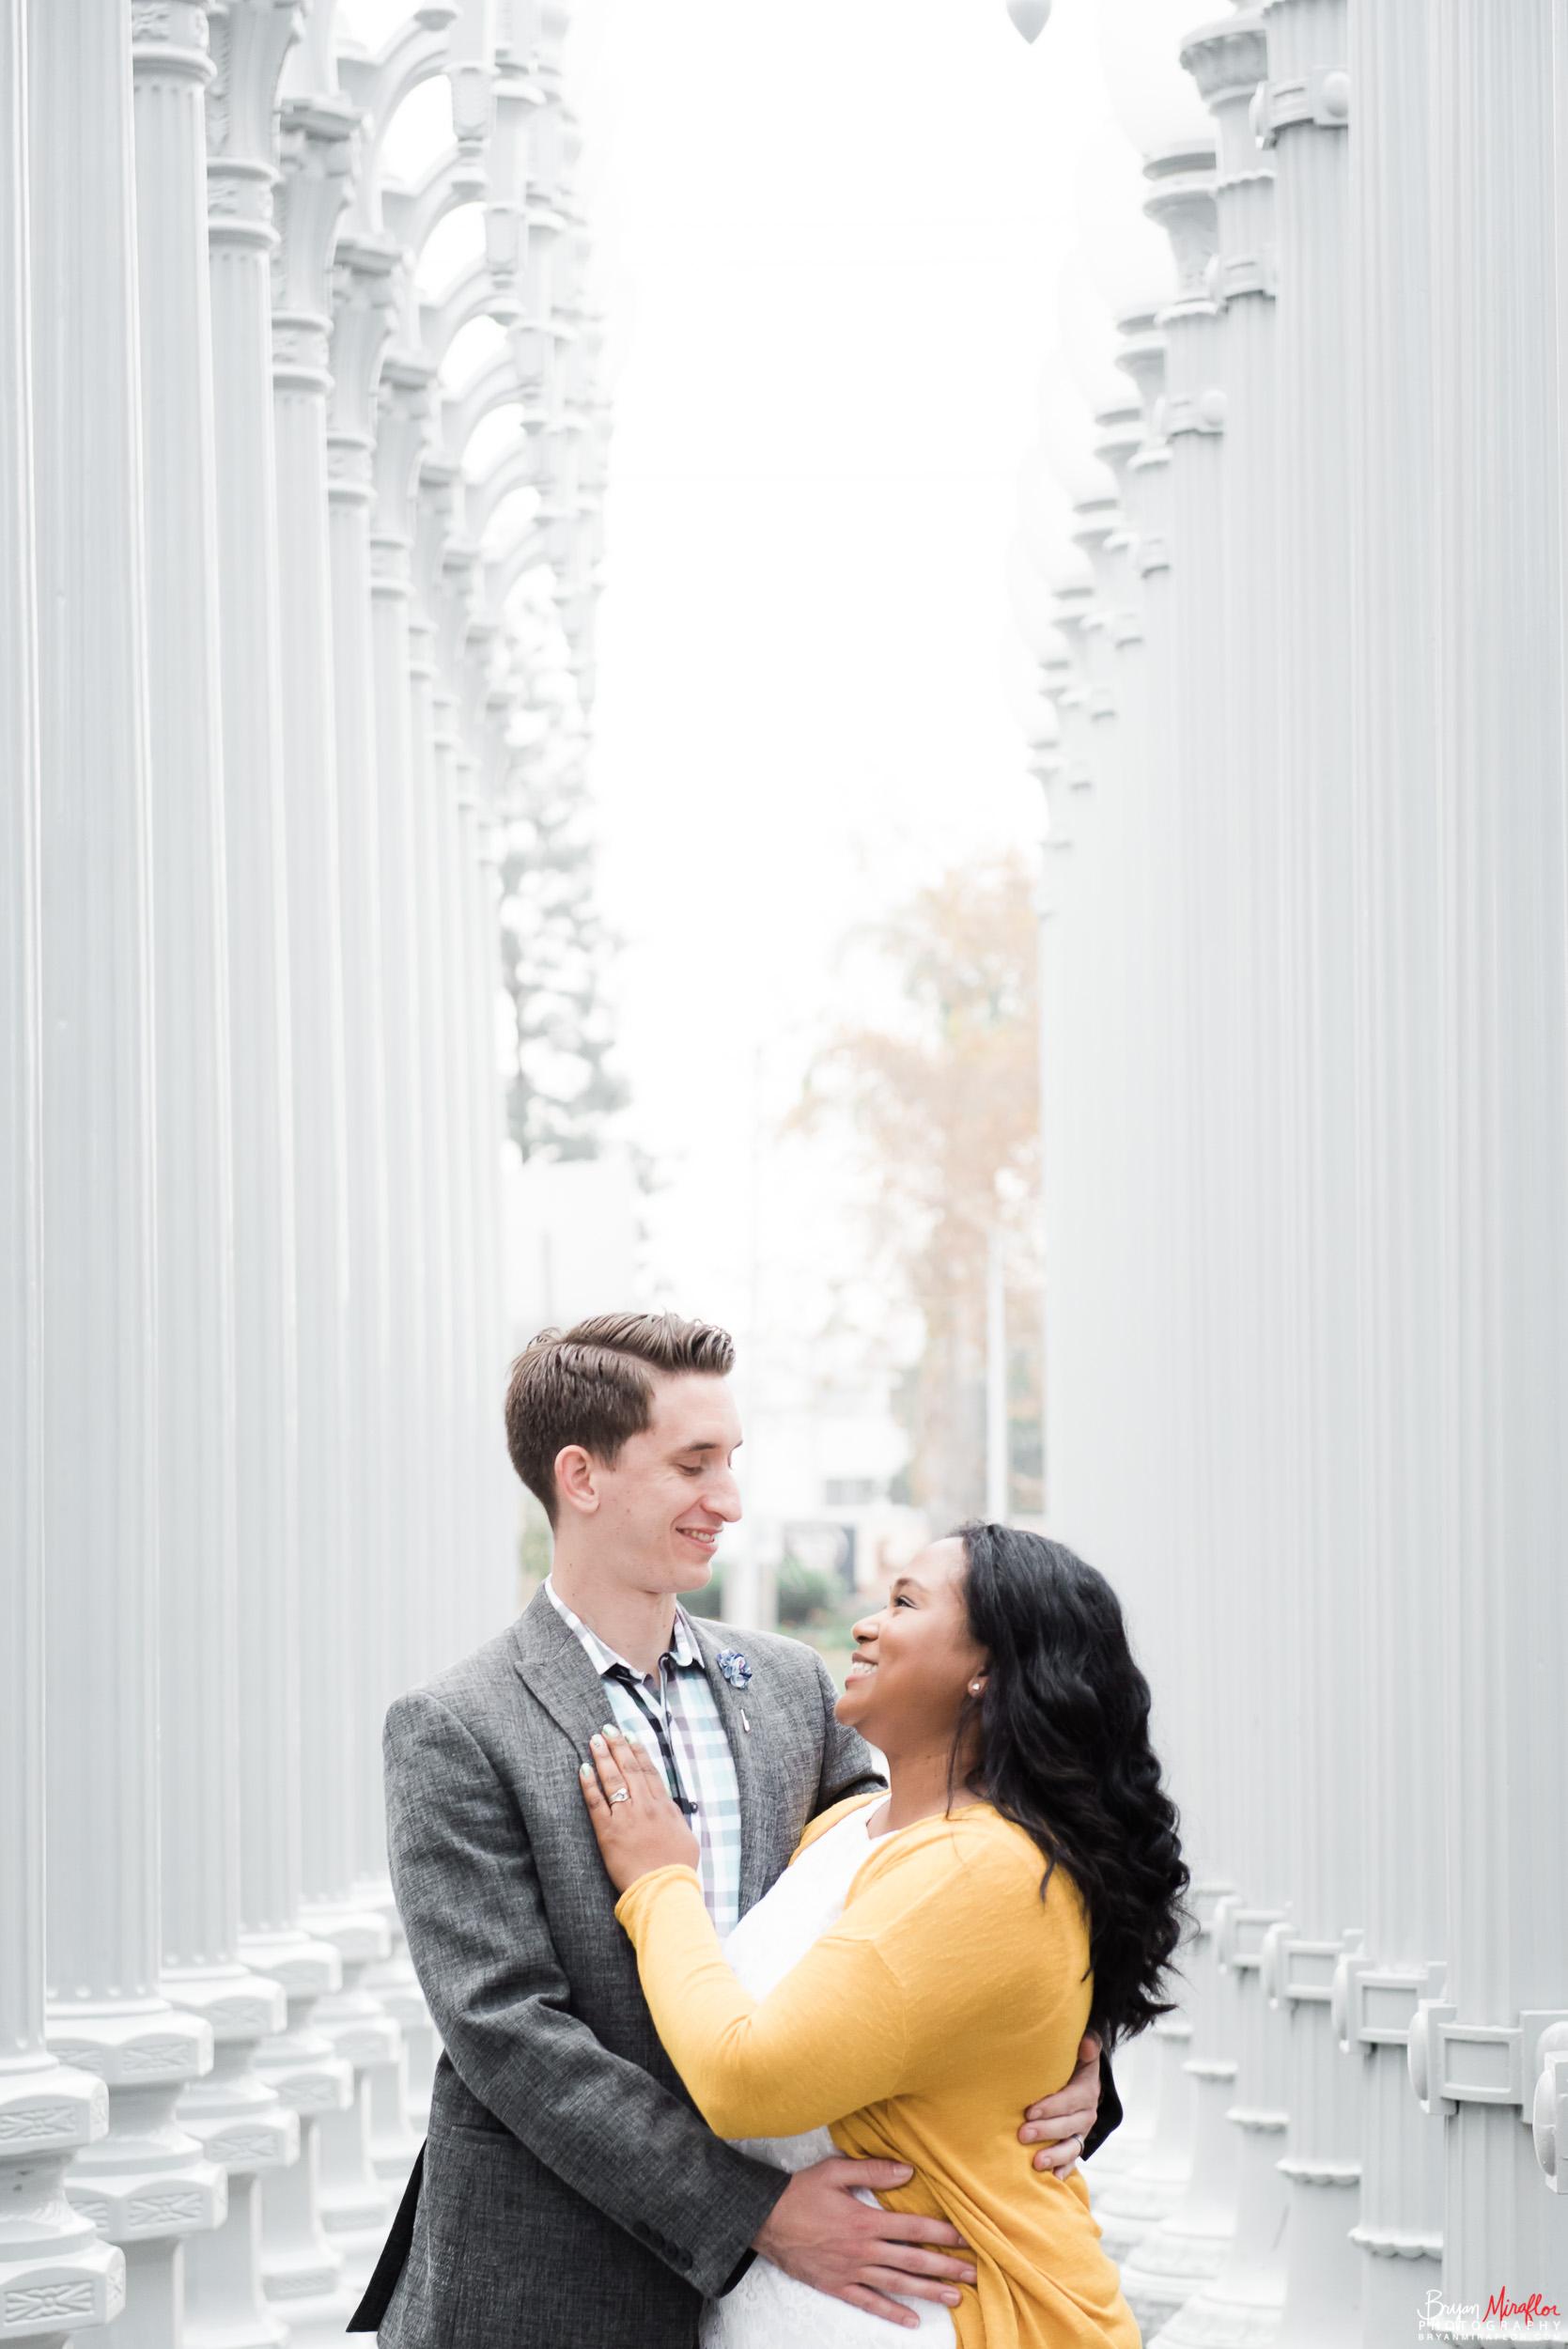 Bryan-Miraflor-Photography-Vanessa-Tommy-LACMA-DTLA-Engagement-Photoshoot-20161210-84.jpg